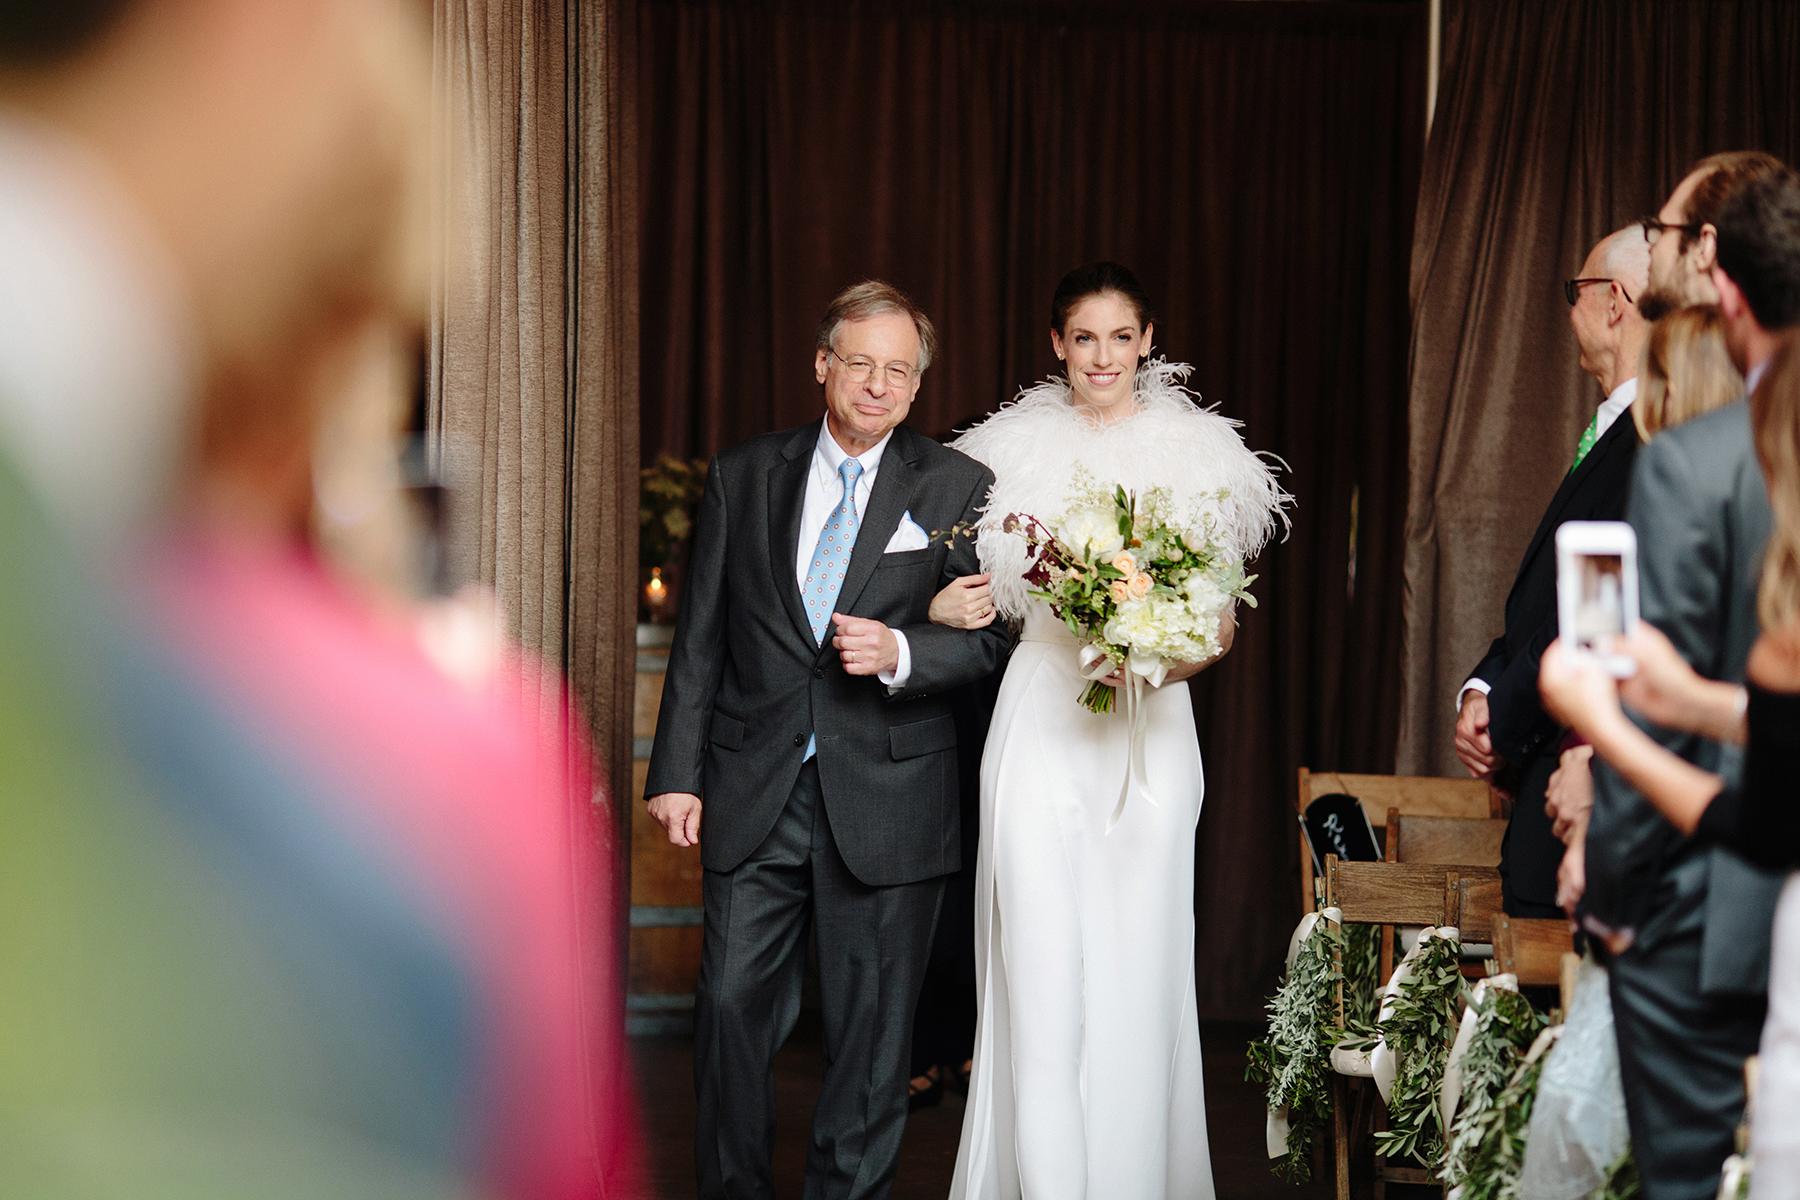 raquelreis_wedding_photography_brooklynwinery_026.jpg